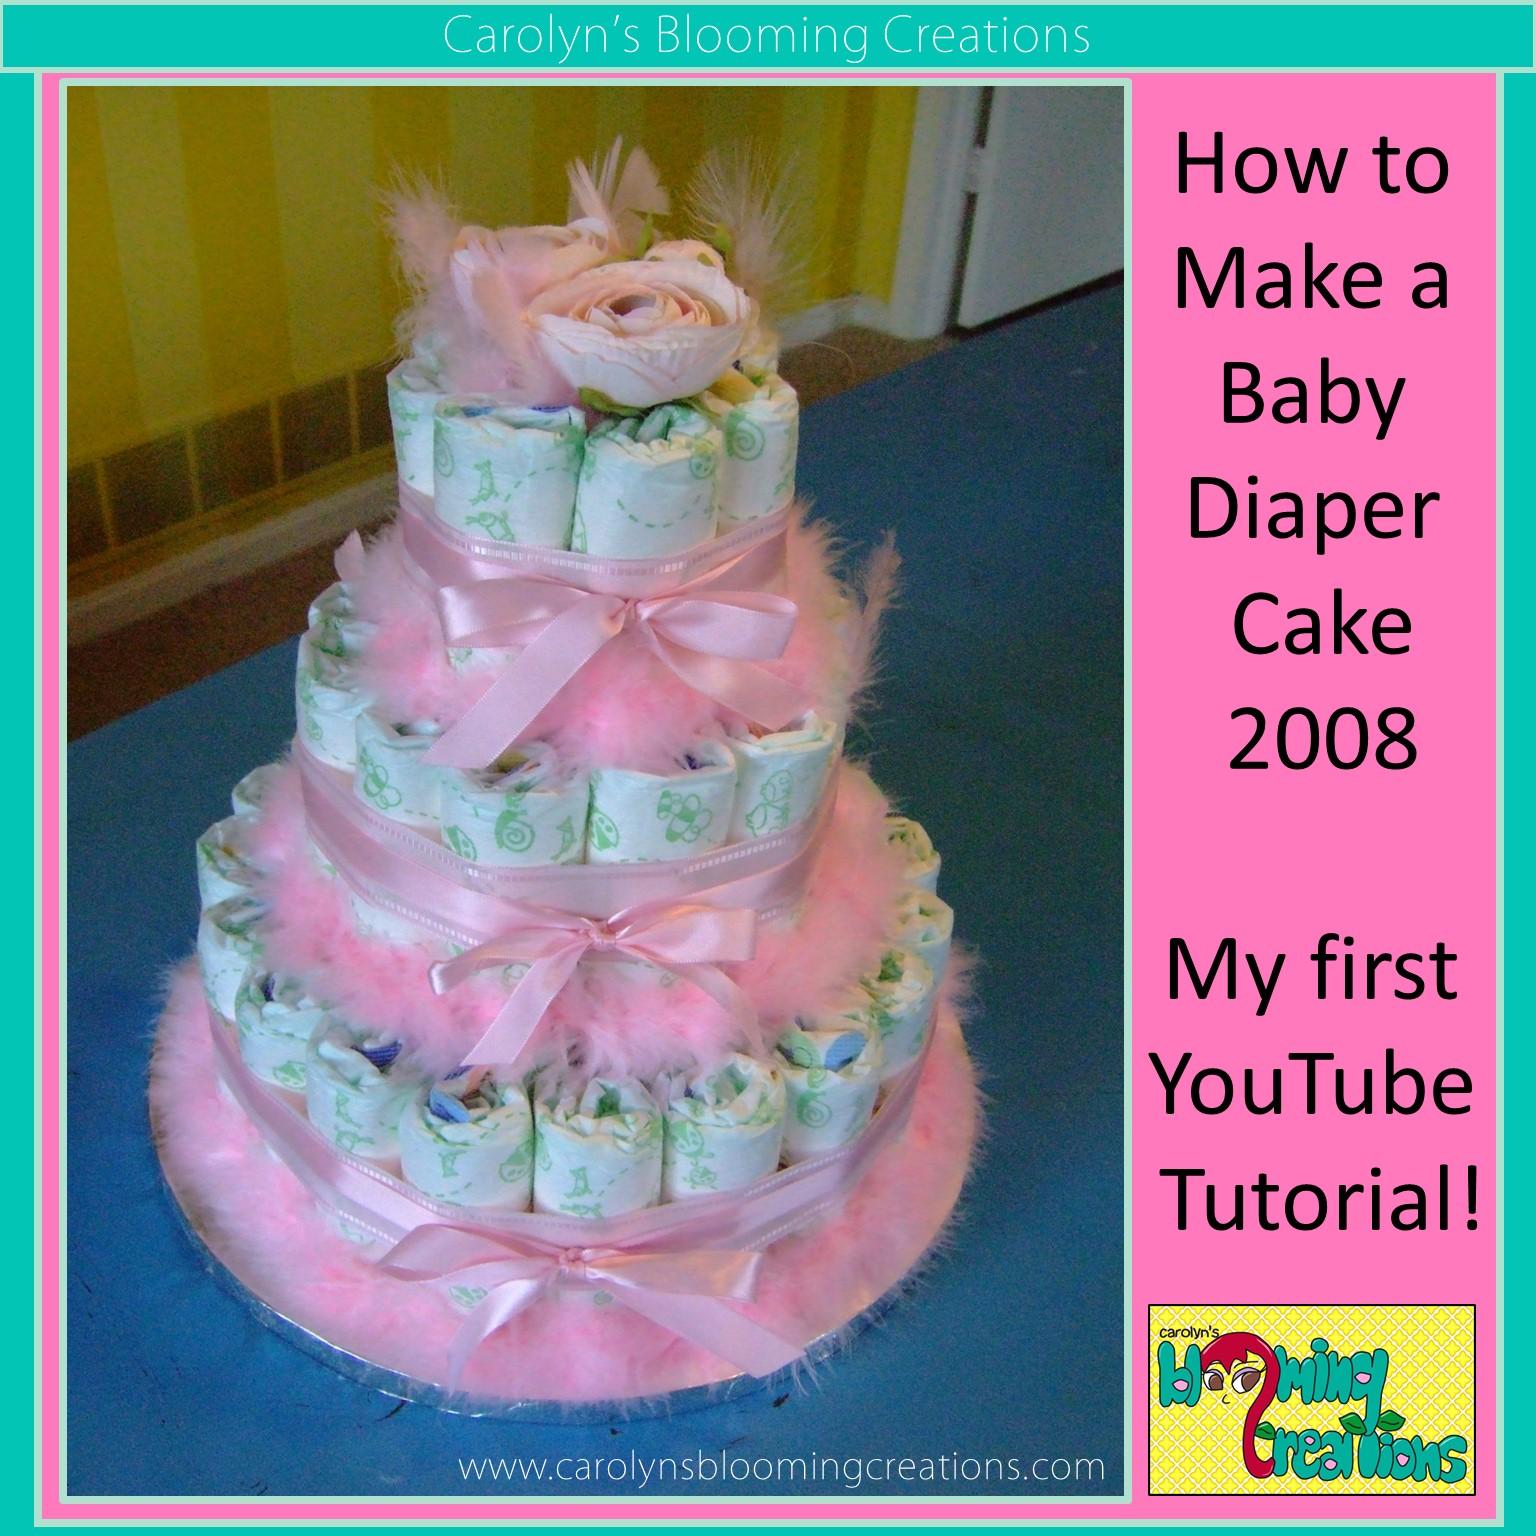 Carolyn J Braden Baby Diaper Cake 2008 1.jpg